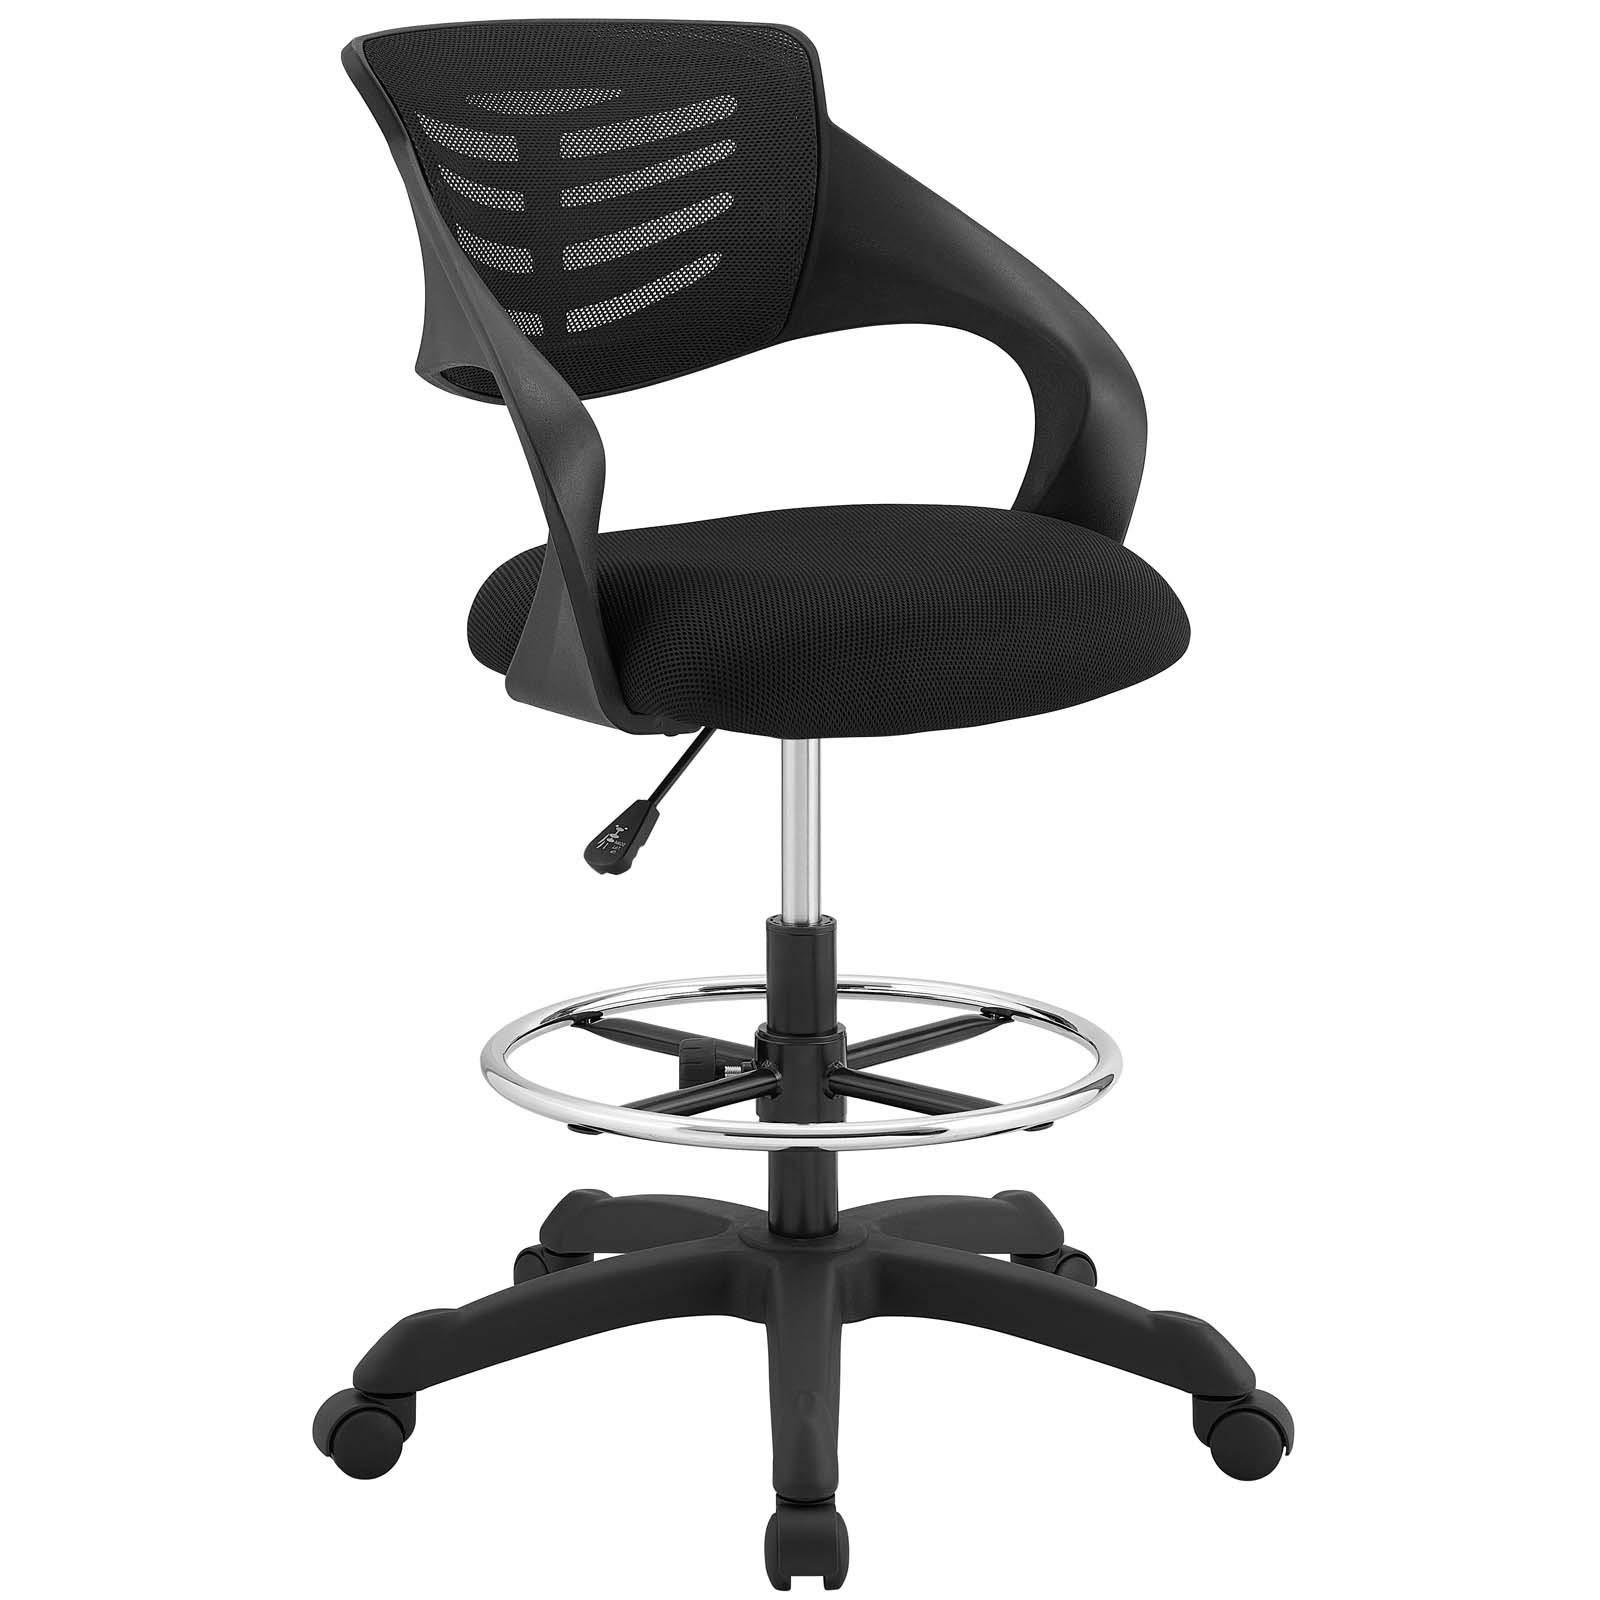 Modway EEI-3040-BLK Thrive Mesh Drafting Chair, Black (Renewed)